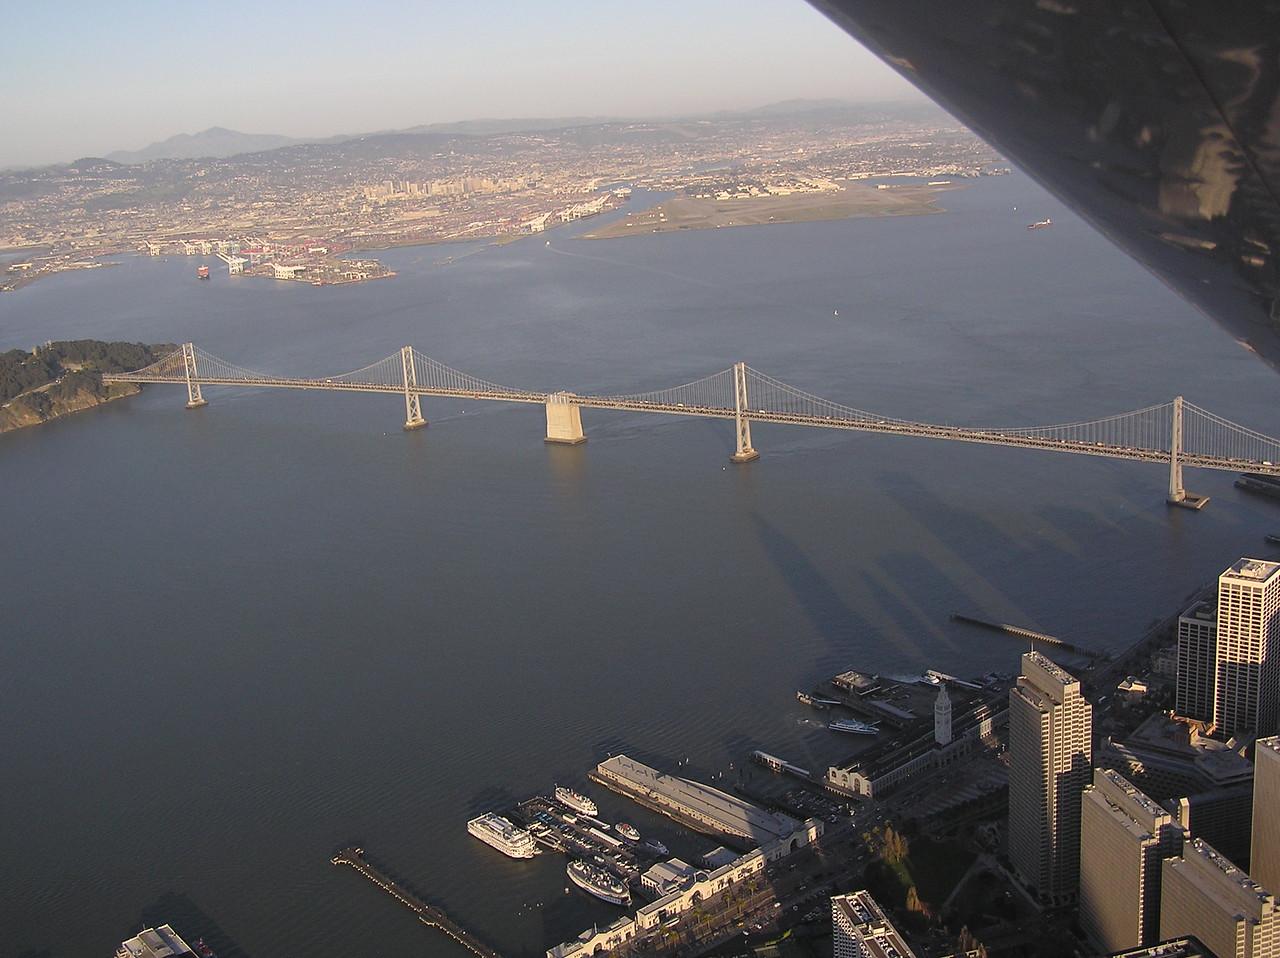 West end of San Francisco Bay Bridge